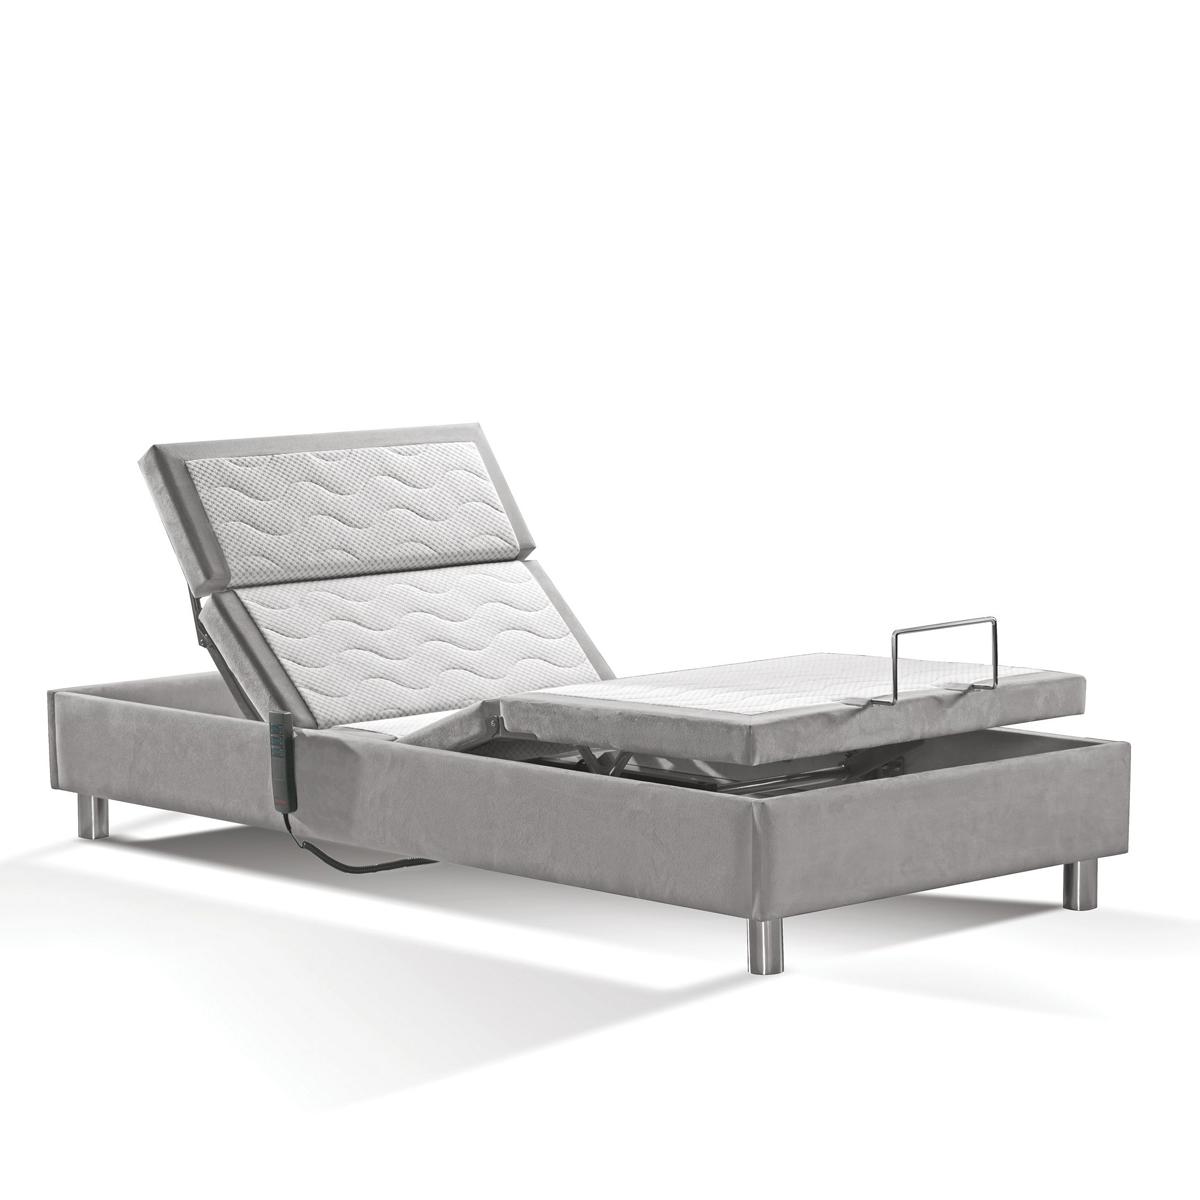 lust Lust Bed base colunex lust sommier 01